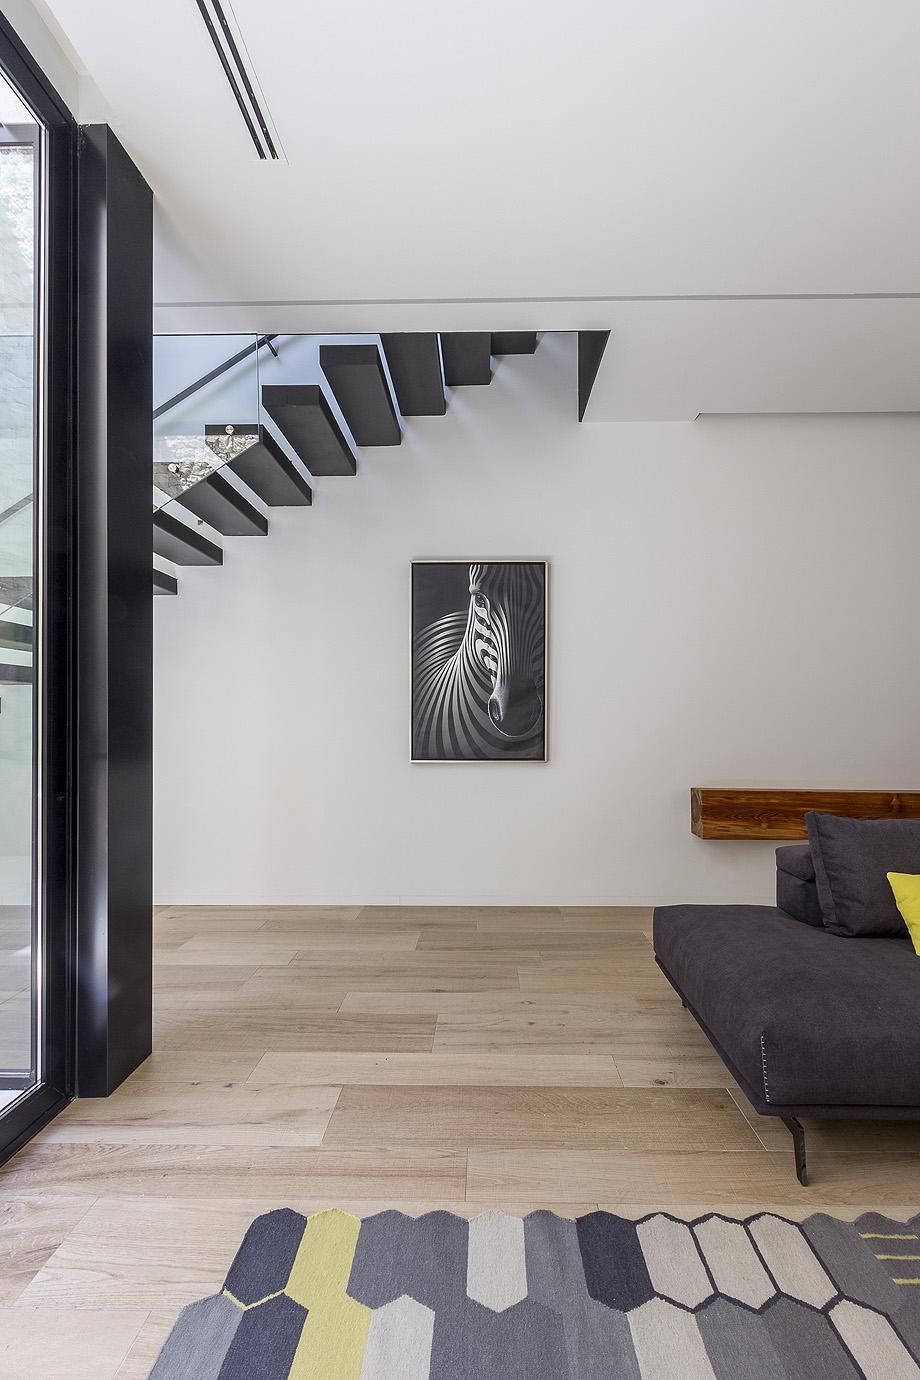 calaiaia de chiralt arquitectos - foto eva perez (6)